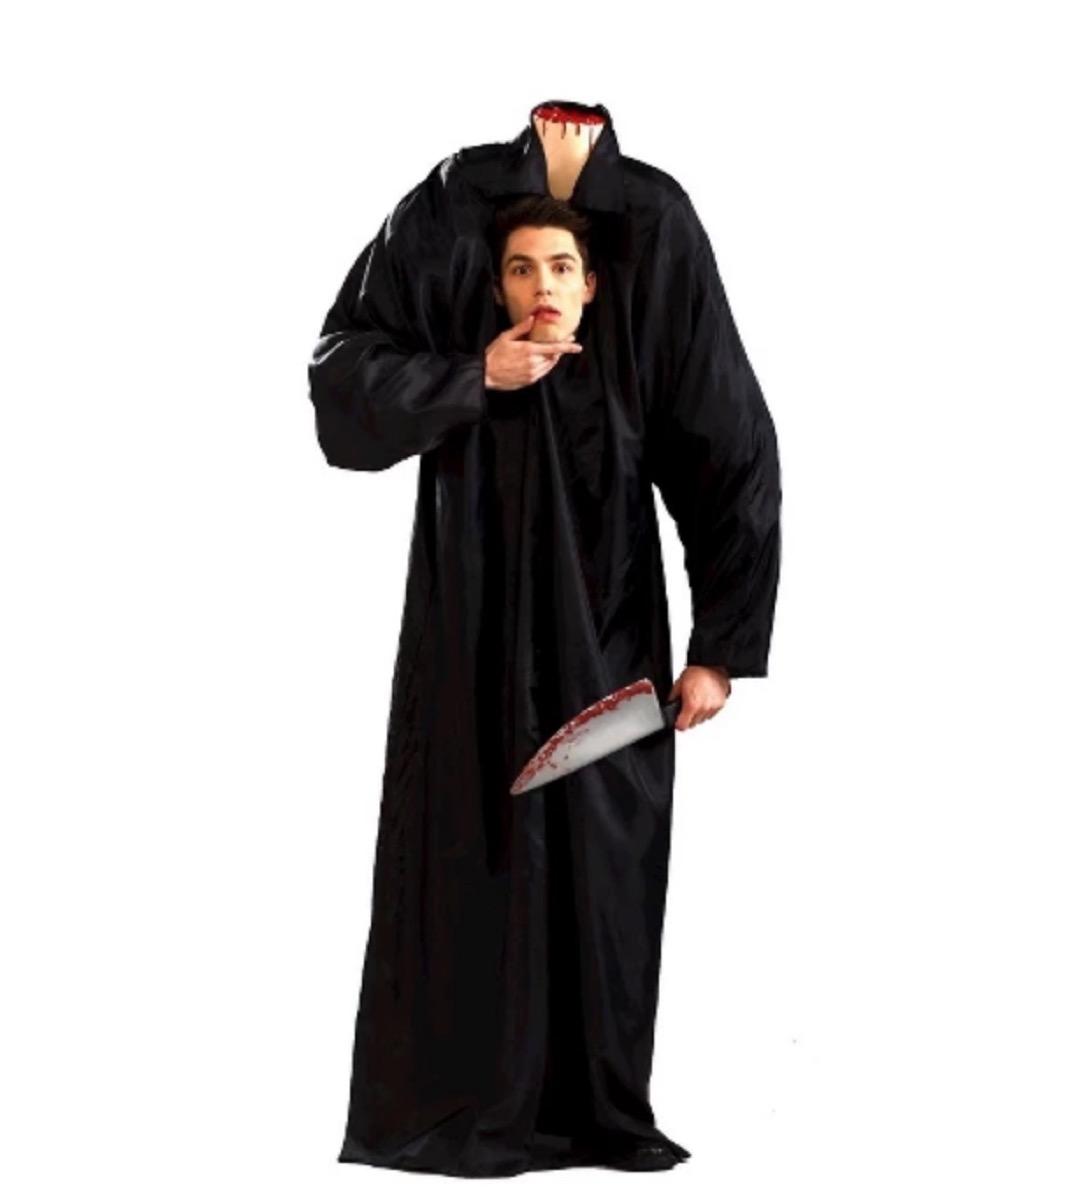 headless corpse costume, best halloween costumes